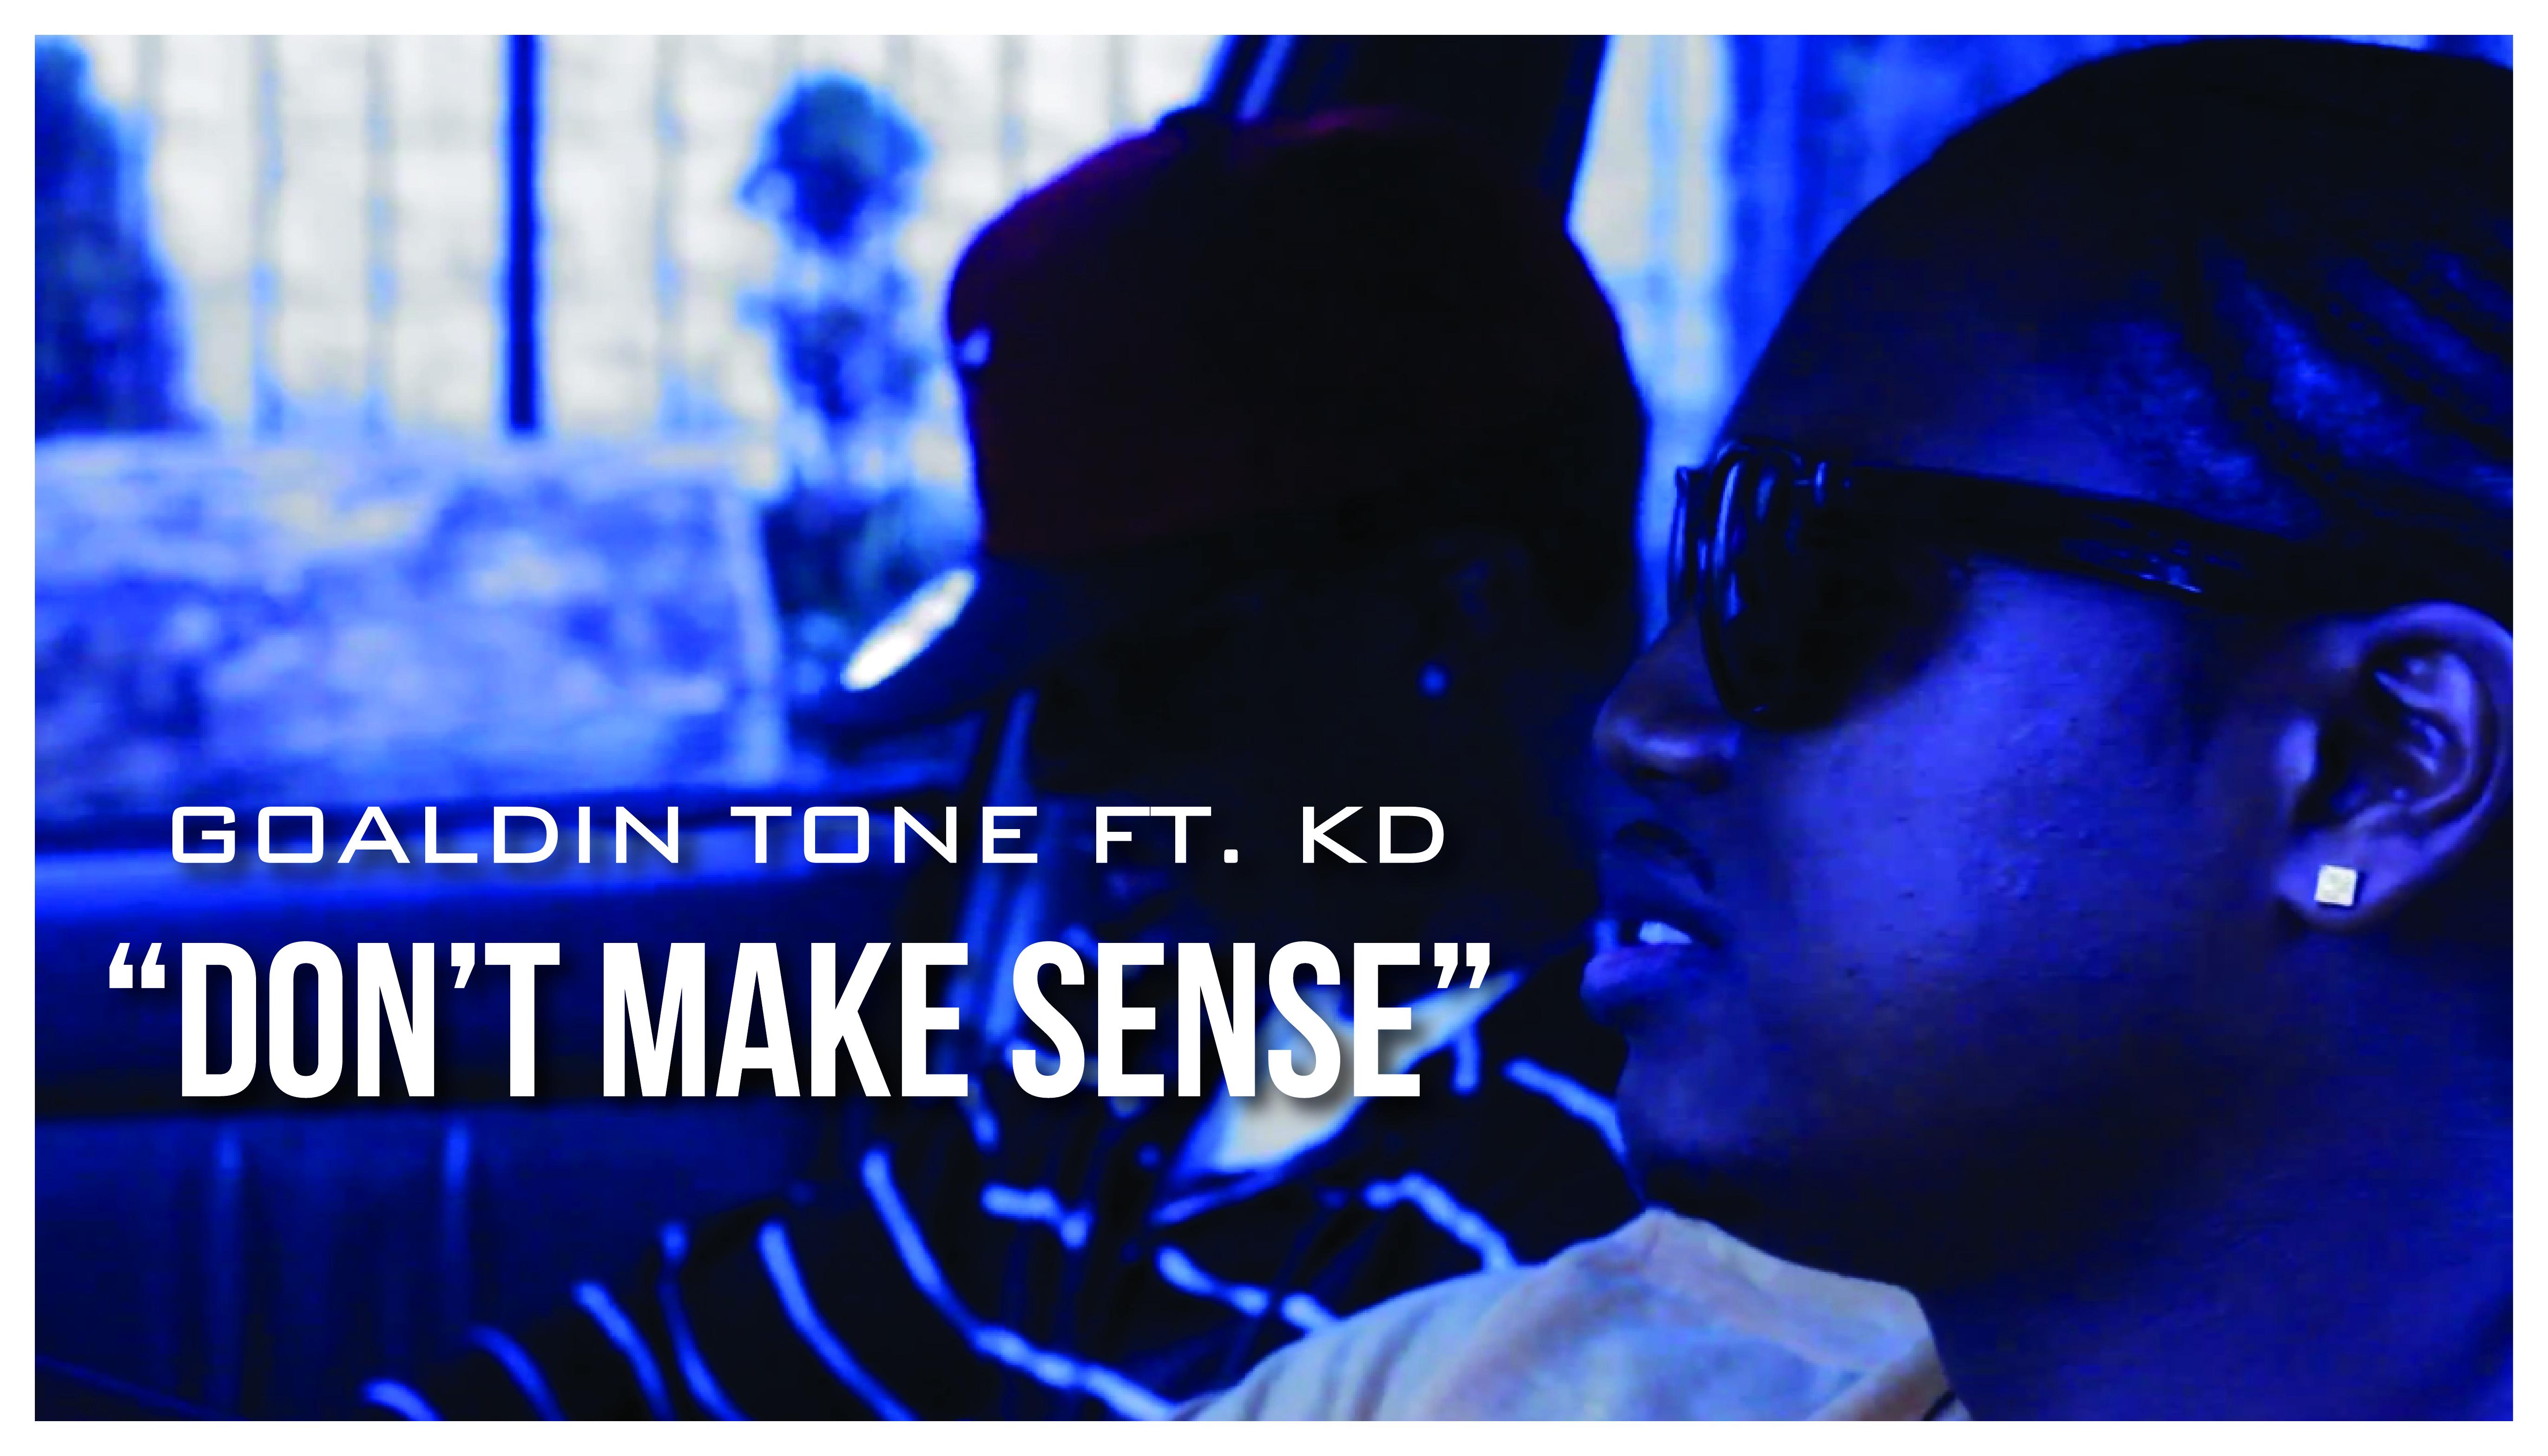 dontmakesense-01 Goaldin Tone (@GoaldinToneDZP) ft. KD (@YoungCockyKD) - Don't Make Sense (Produced by @DBrooksDZP)